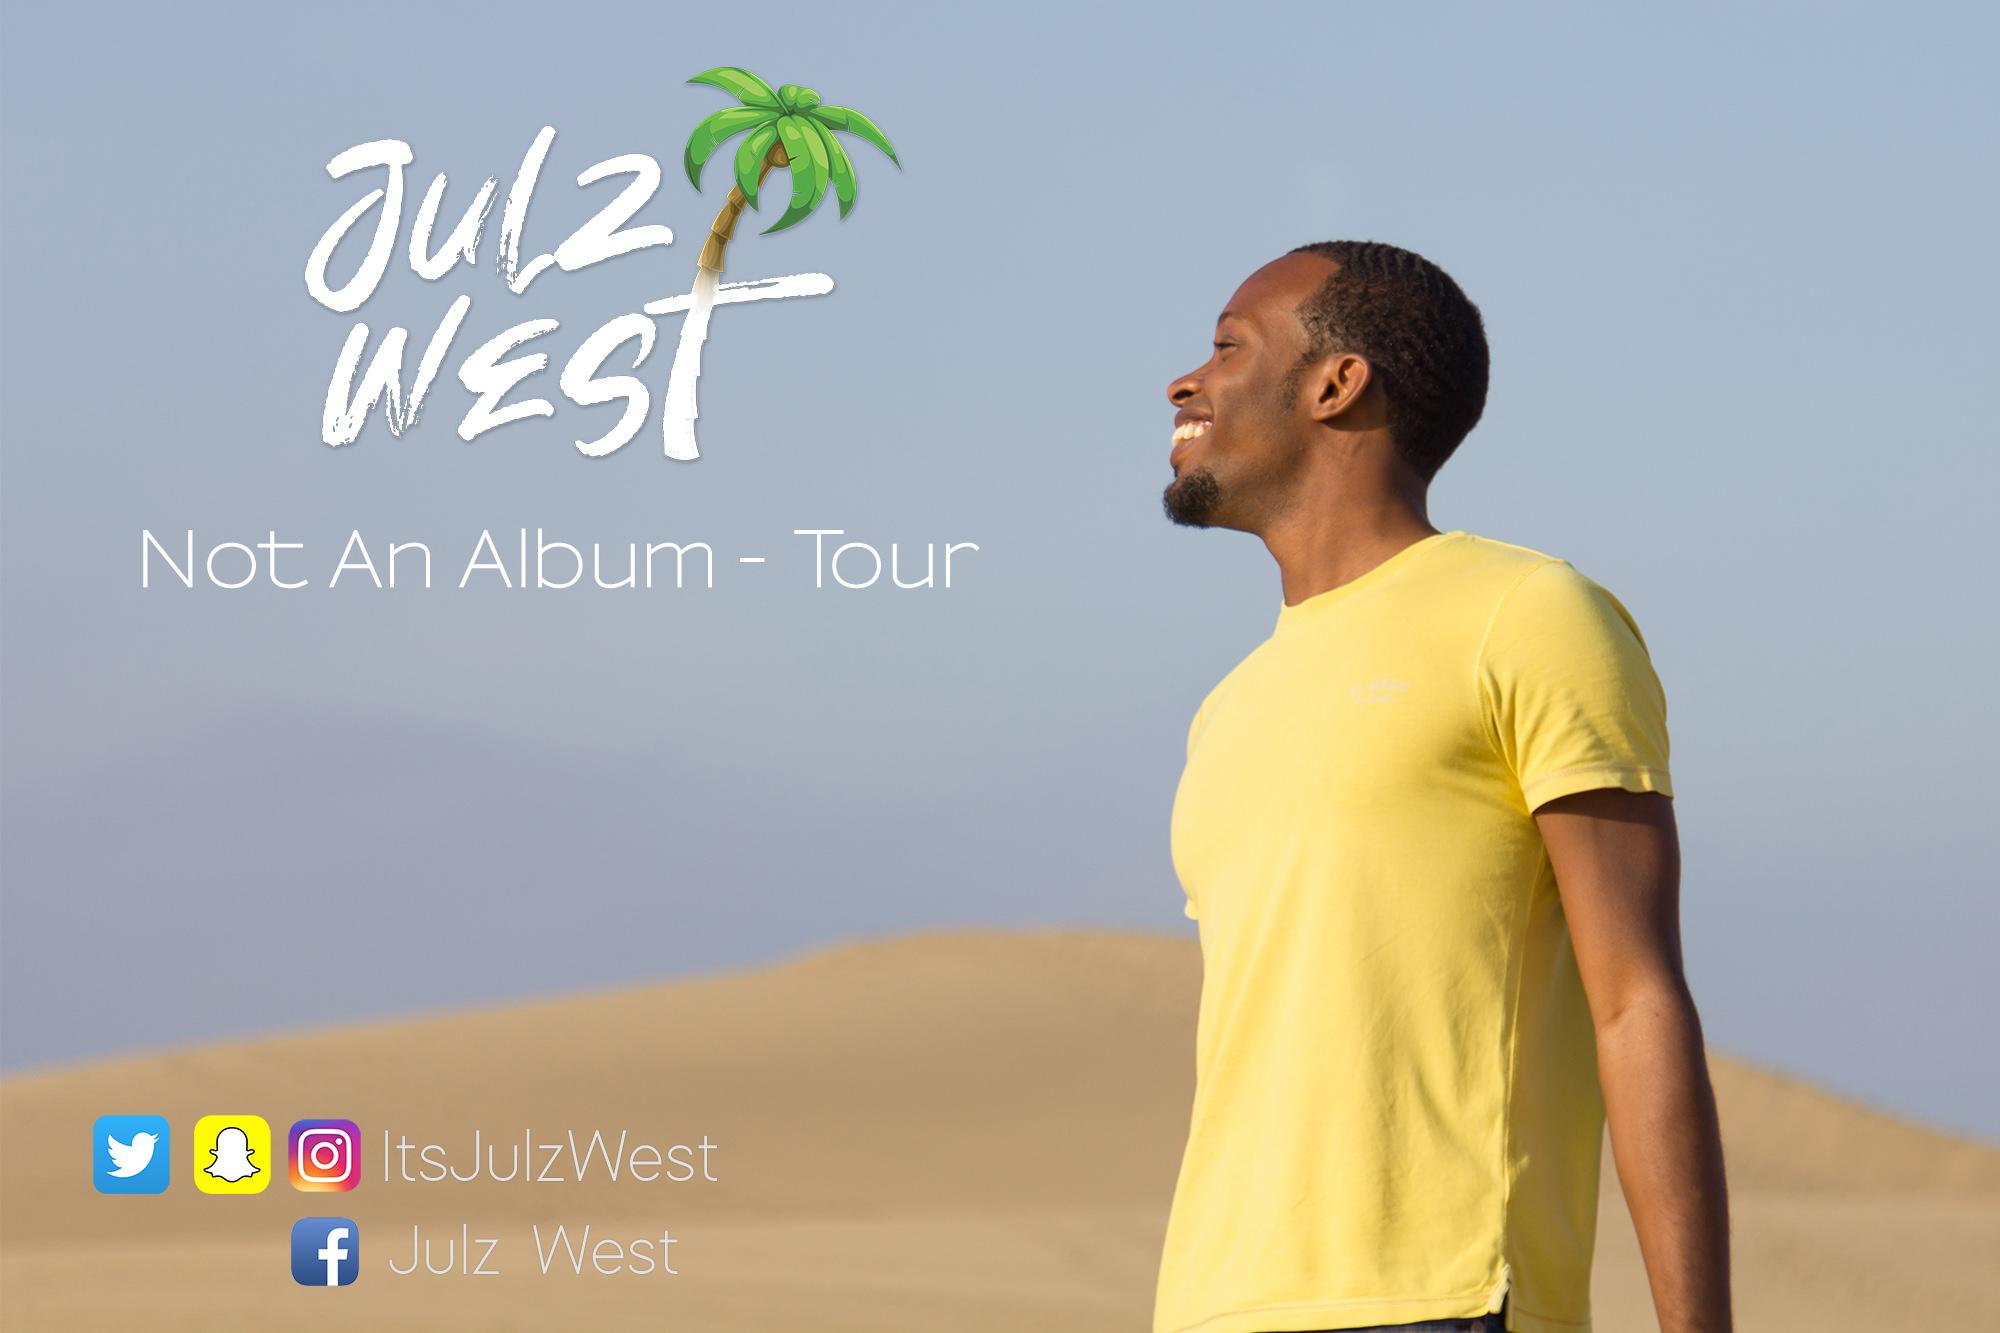 Julz West - Not an Album Tour Japan (Osaka) 2019